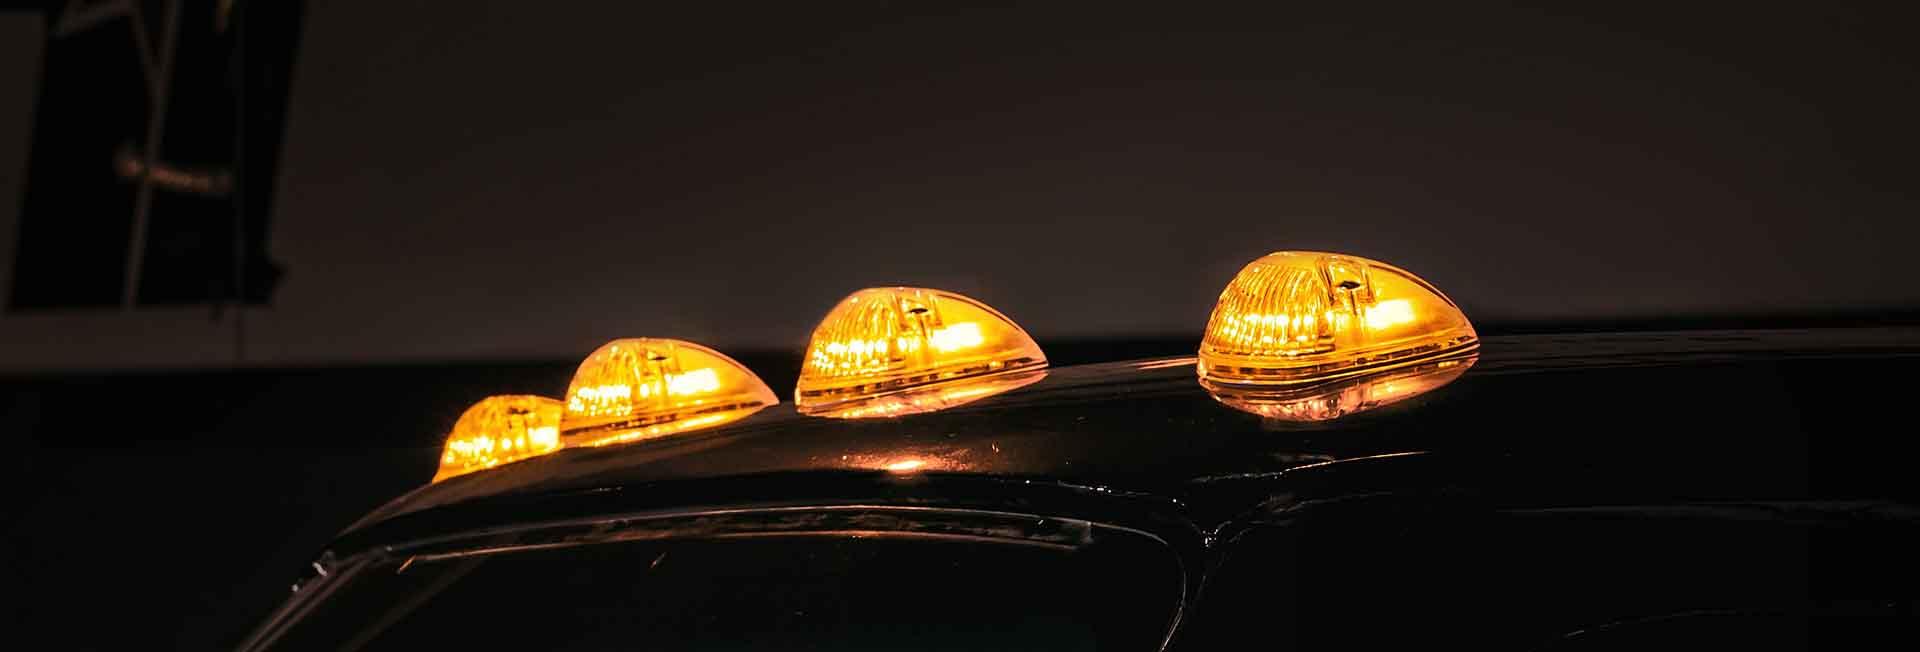 Cab Lights